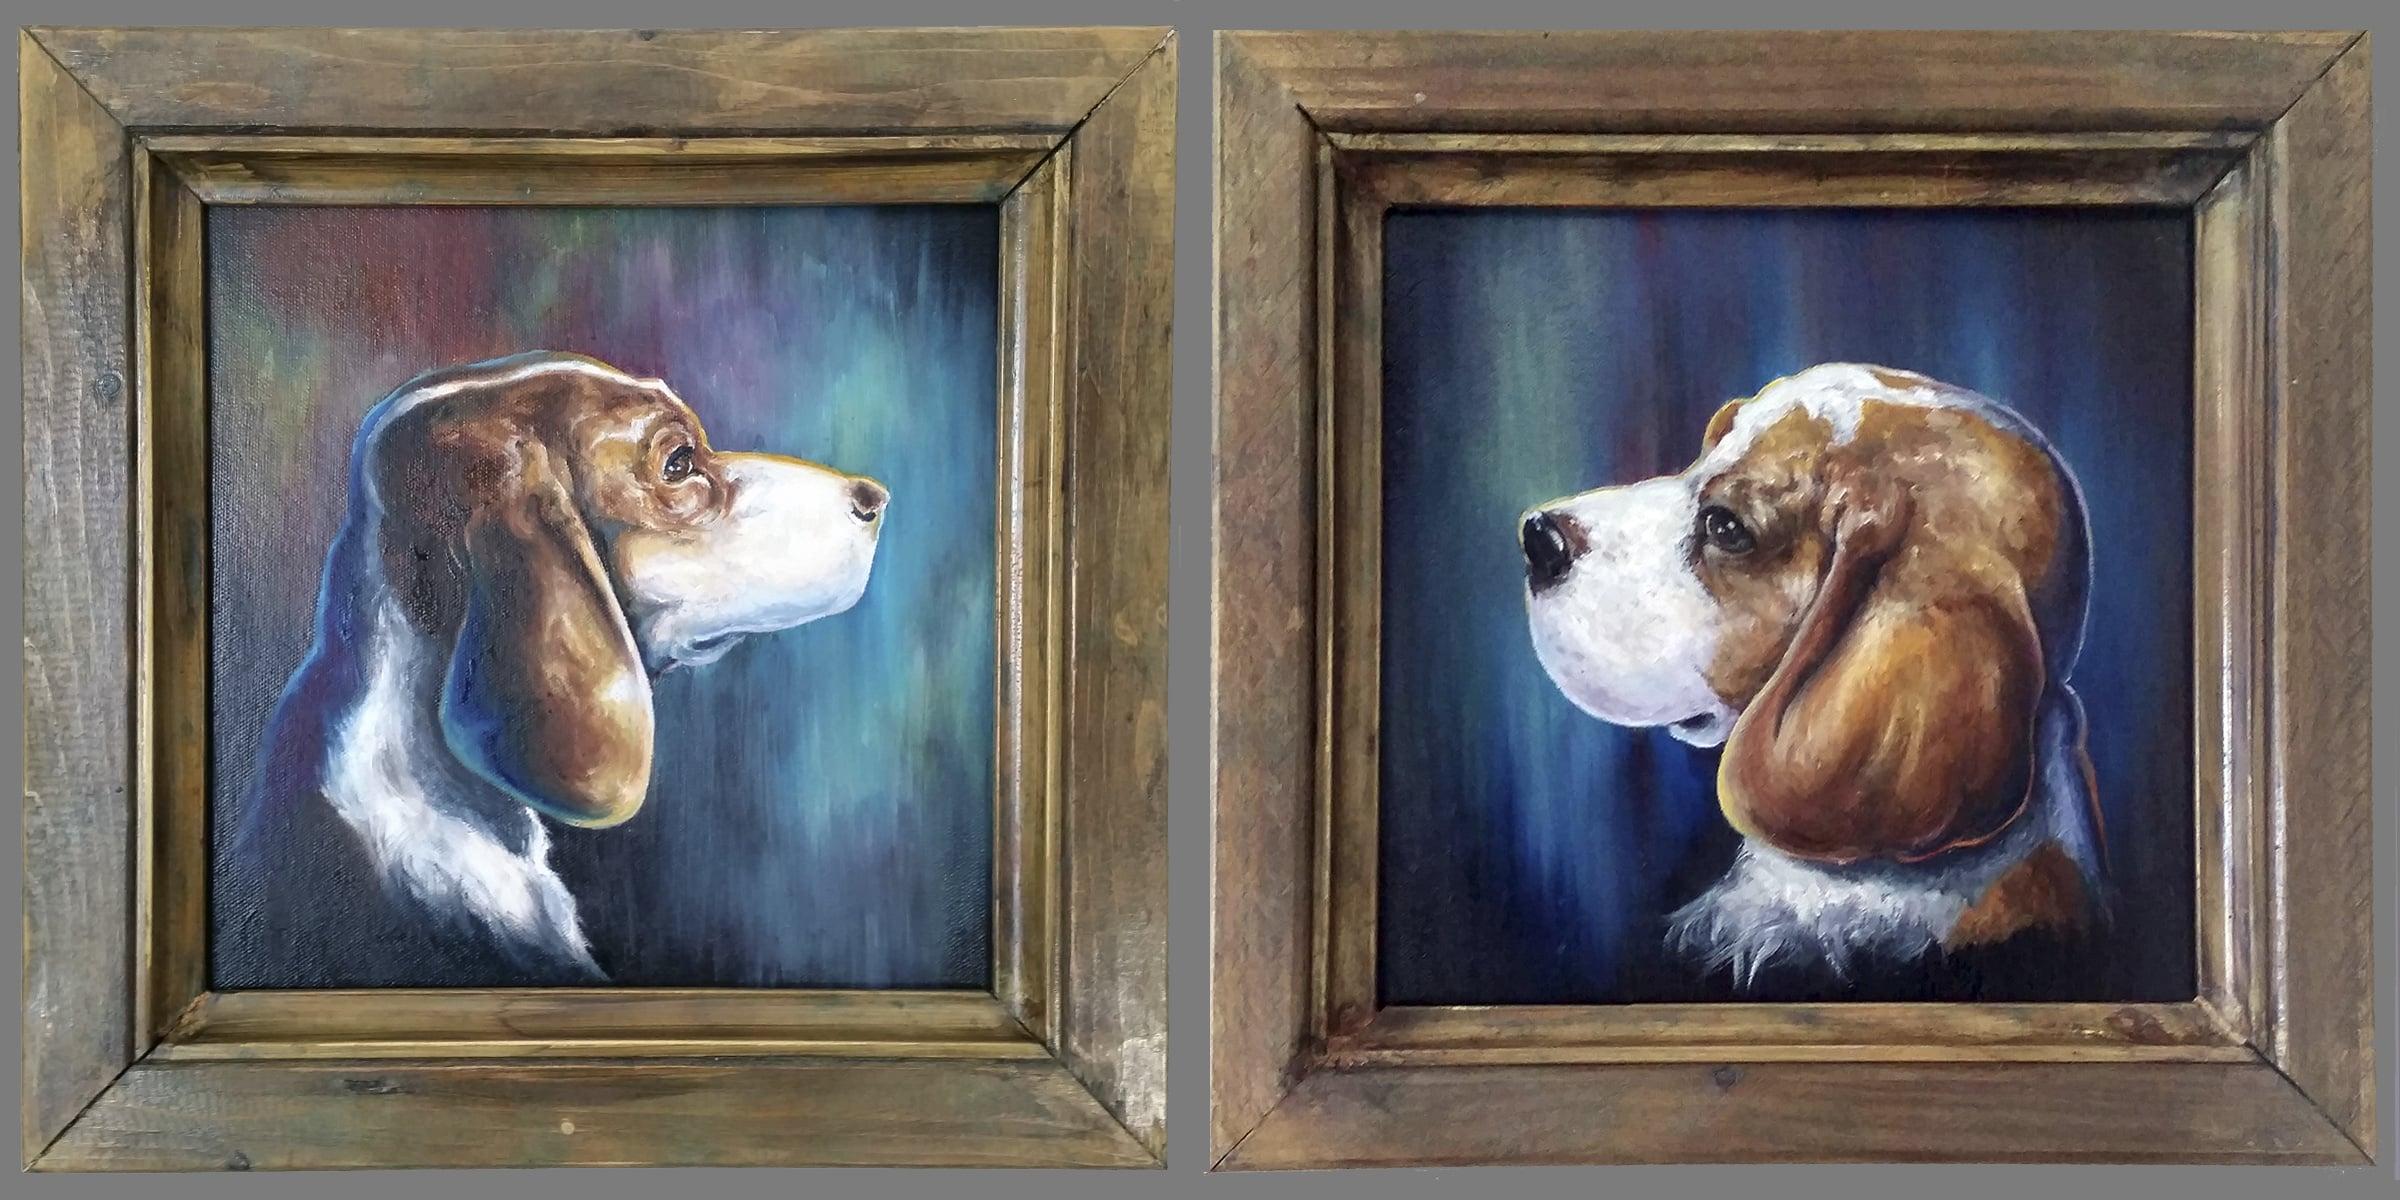 "portrait (human or animal) - oil on canvas                                                             12 x 12"" - $175     24 x 24"" - $275     18 x 24"" - $250     24 x 36"" - $350     36 x 48"" - $450"